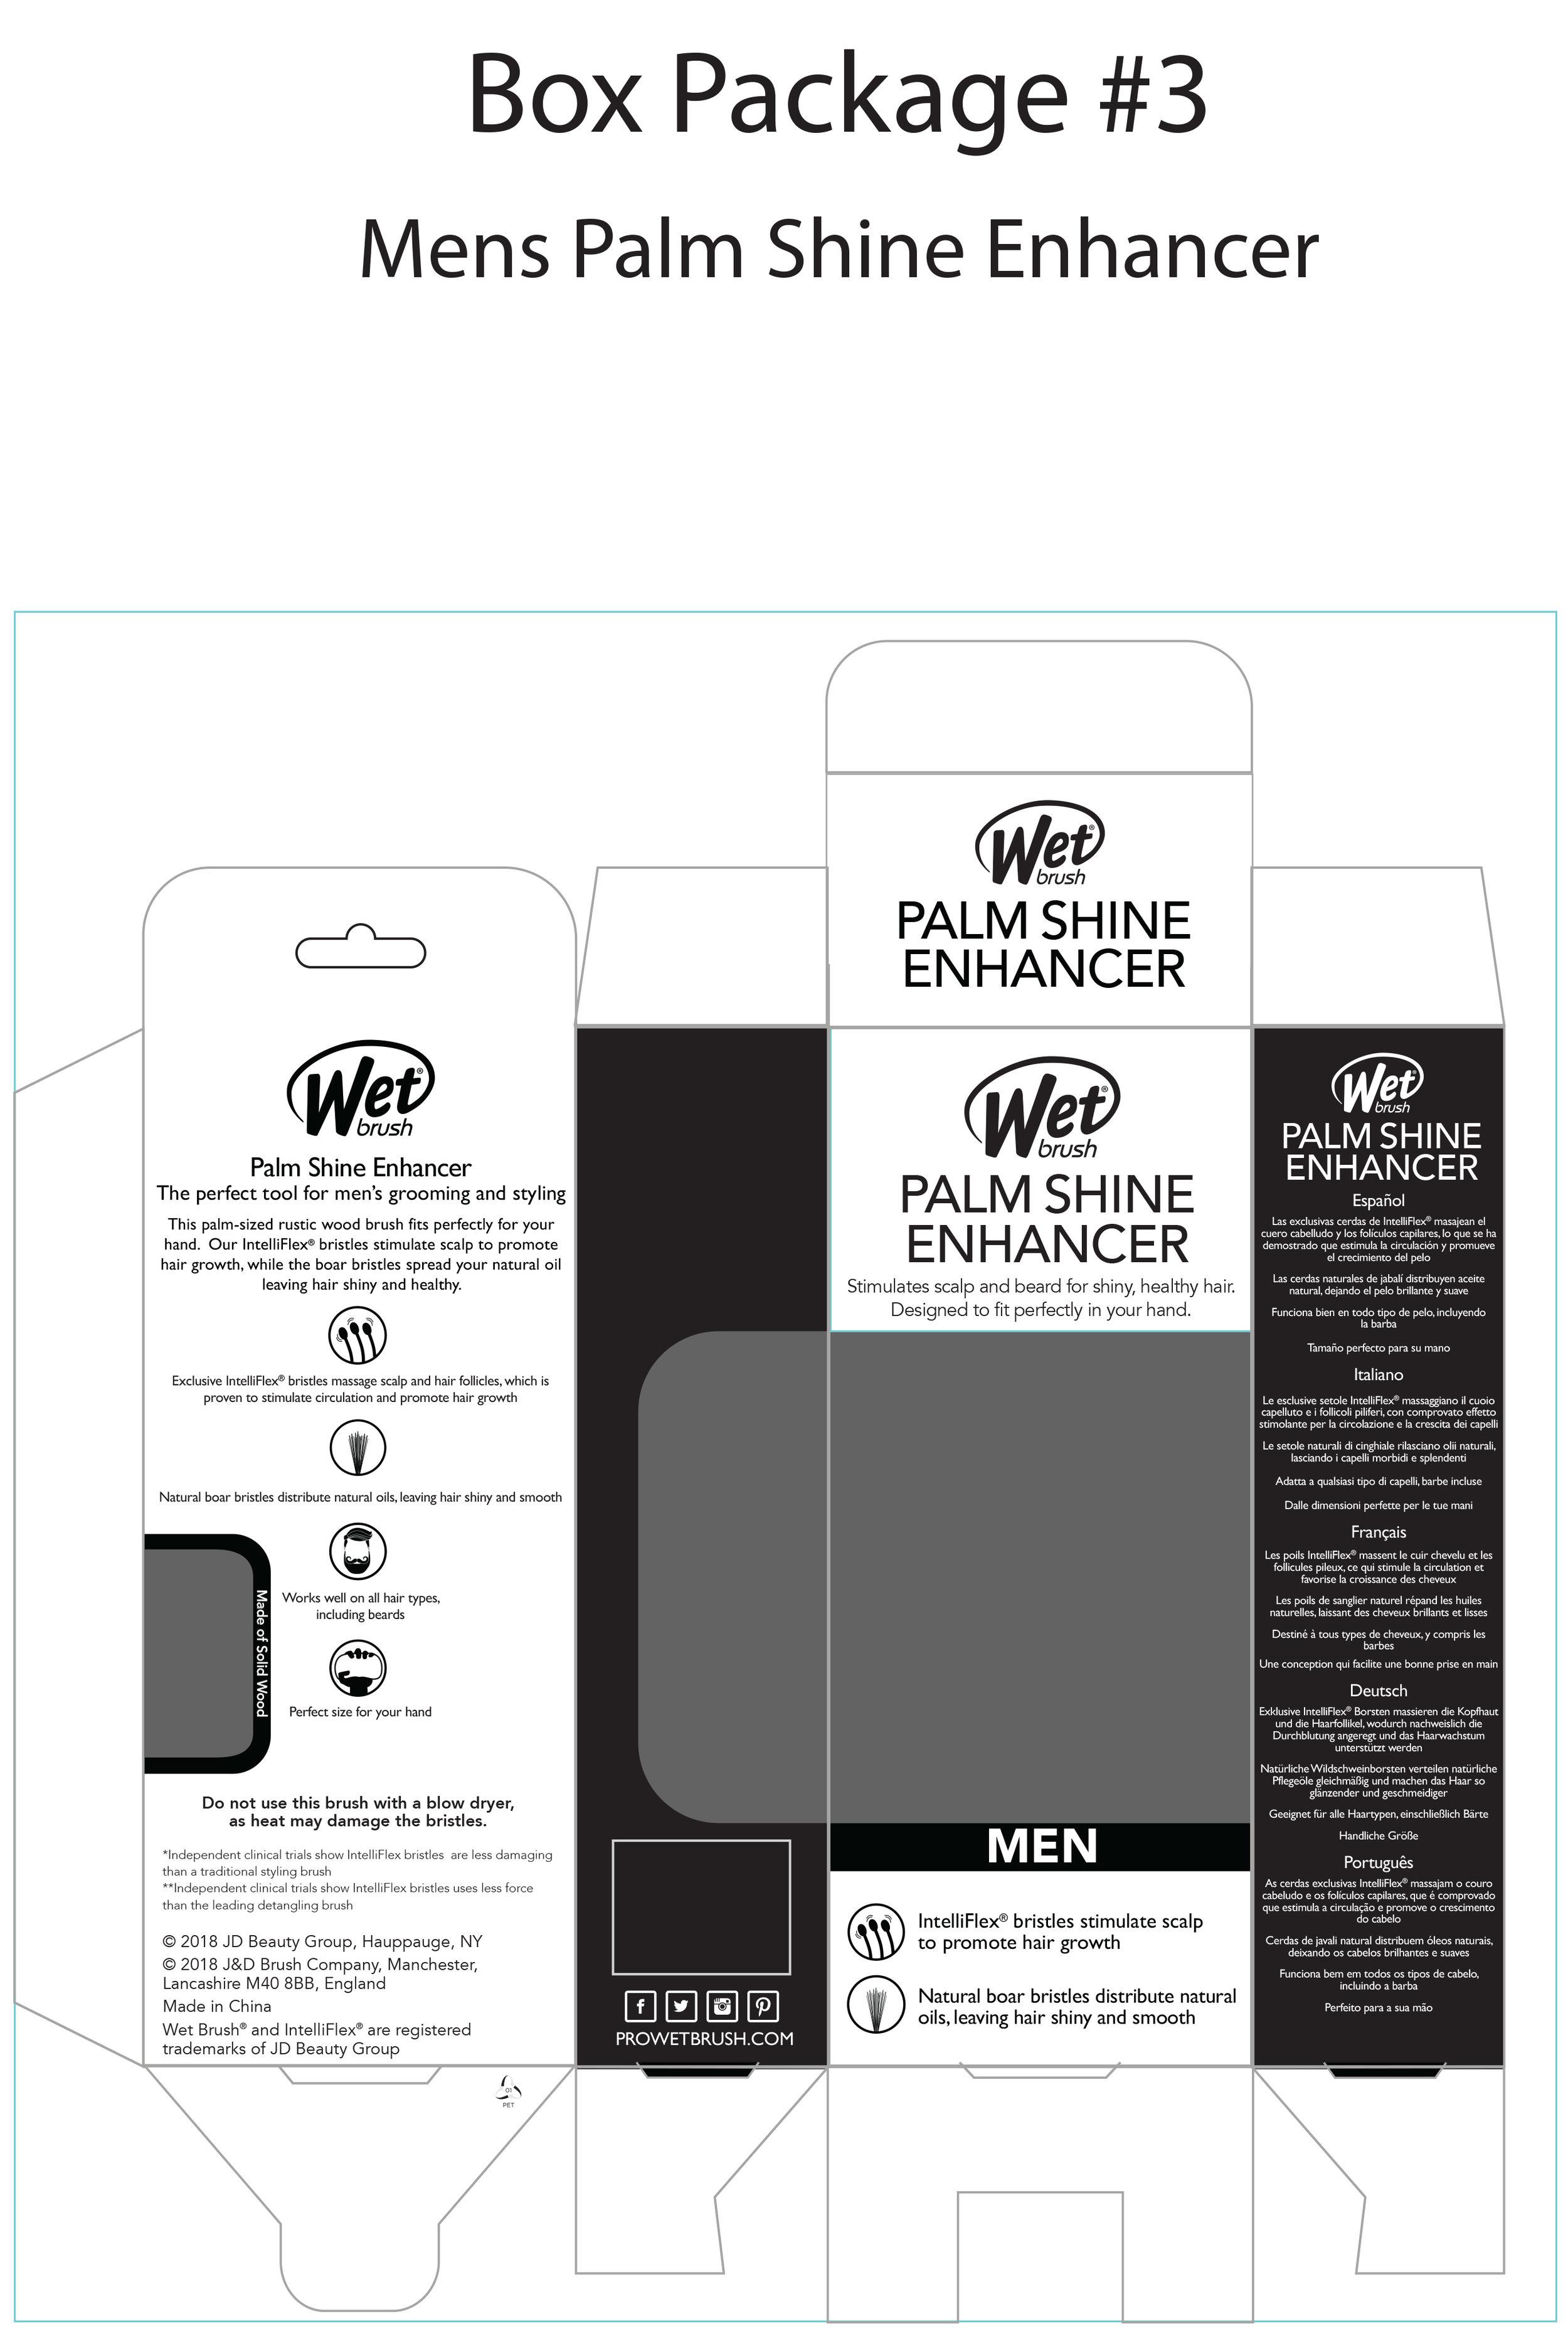 Wet Brush Packaging Copy